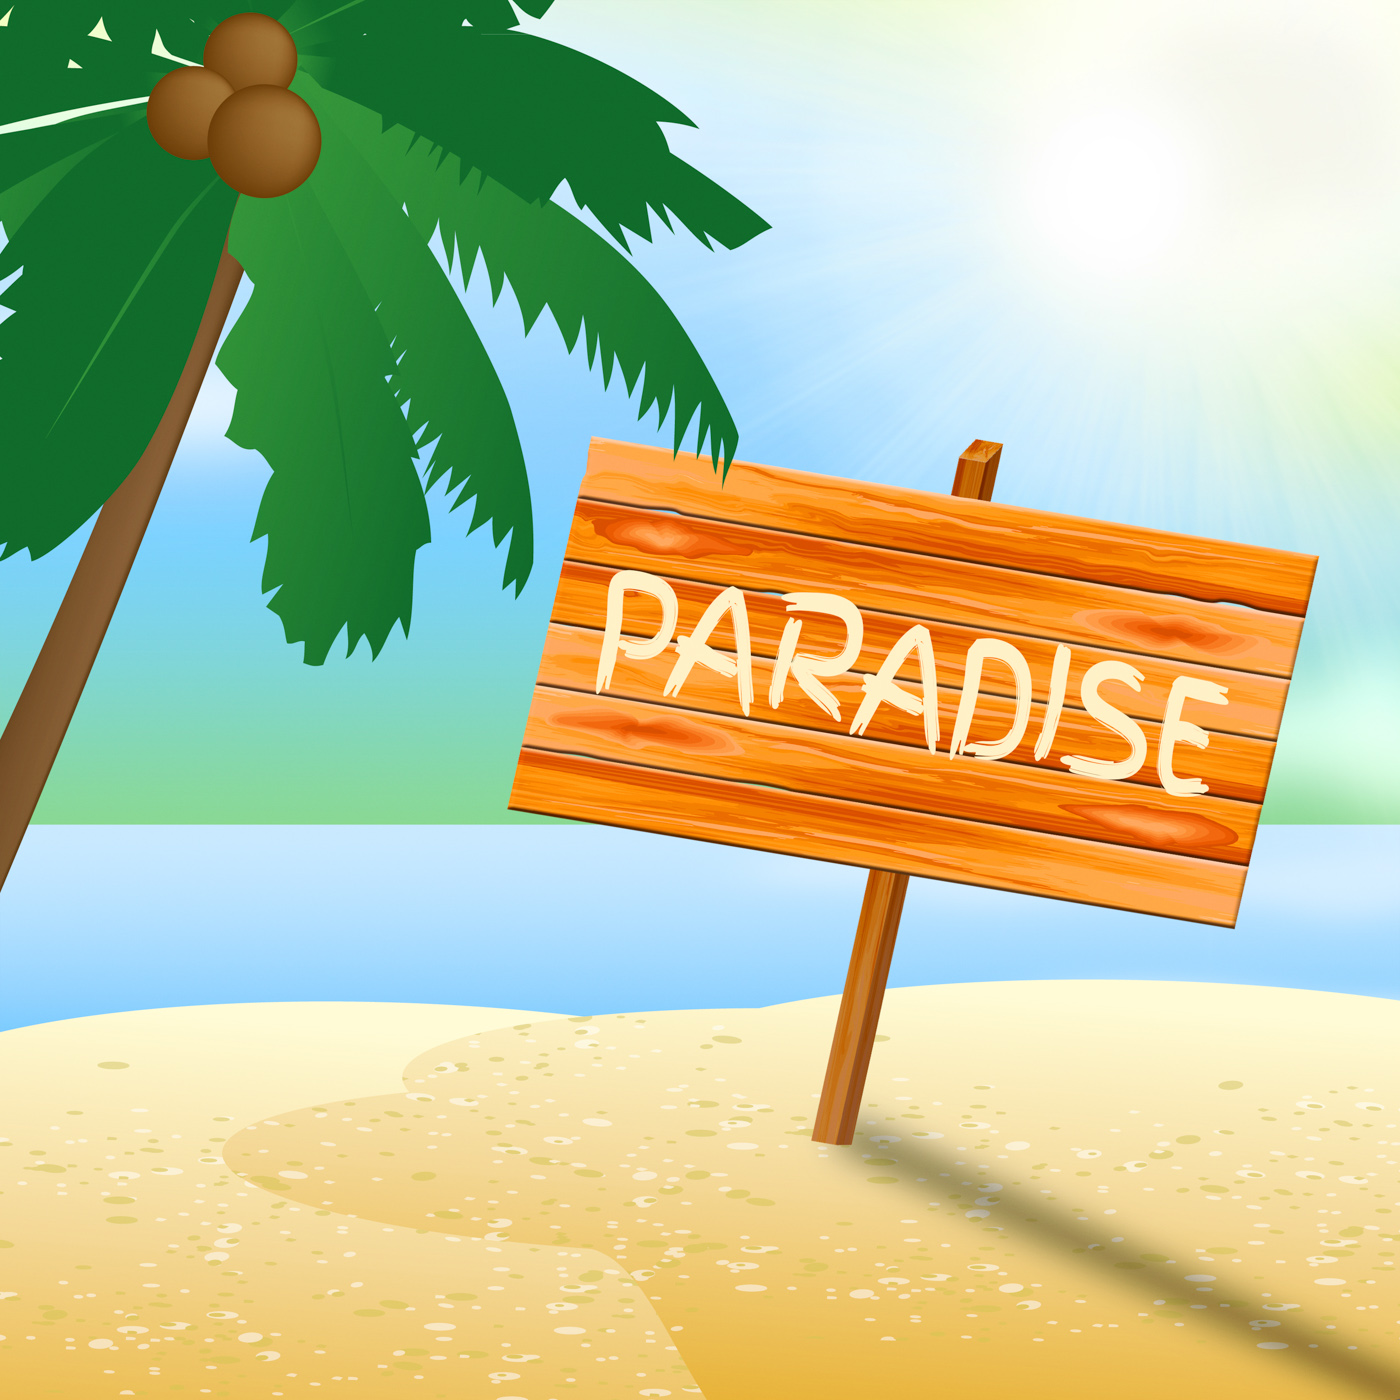 Paradise Vacation Shows Idyllic Beaches 3d Illustration, 3dIllustration, Idyllic, Vacation, Tropical, HQ Photo